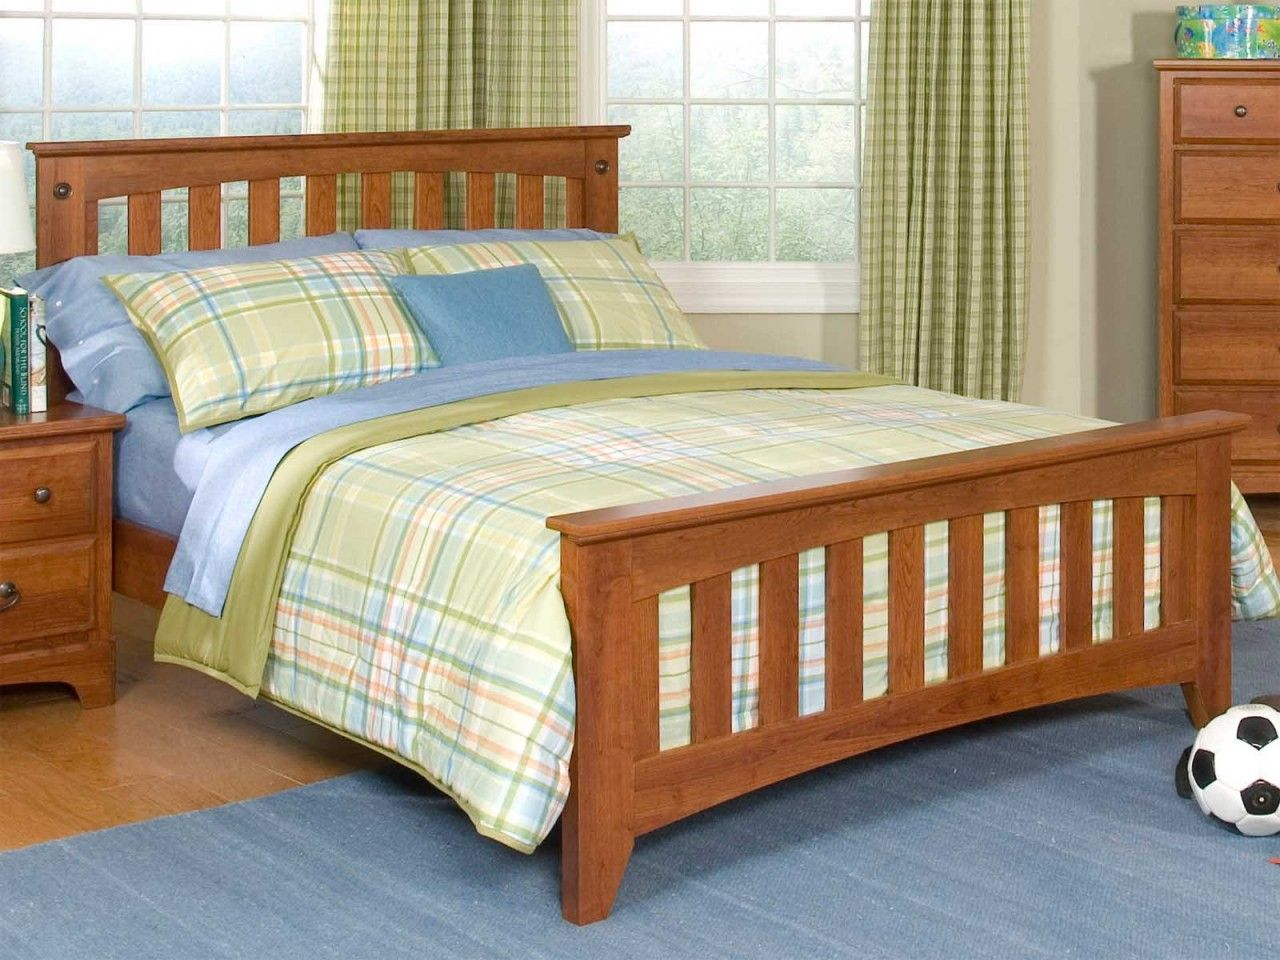 Standard Furniture City Park Kids Full Slat Bed in Star